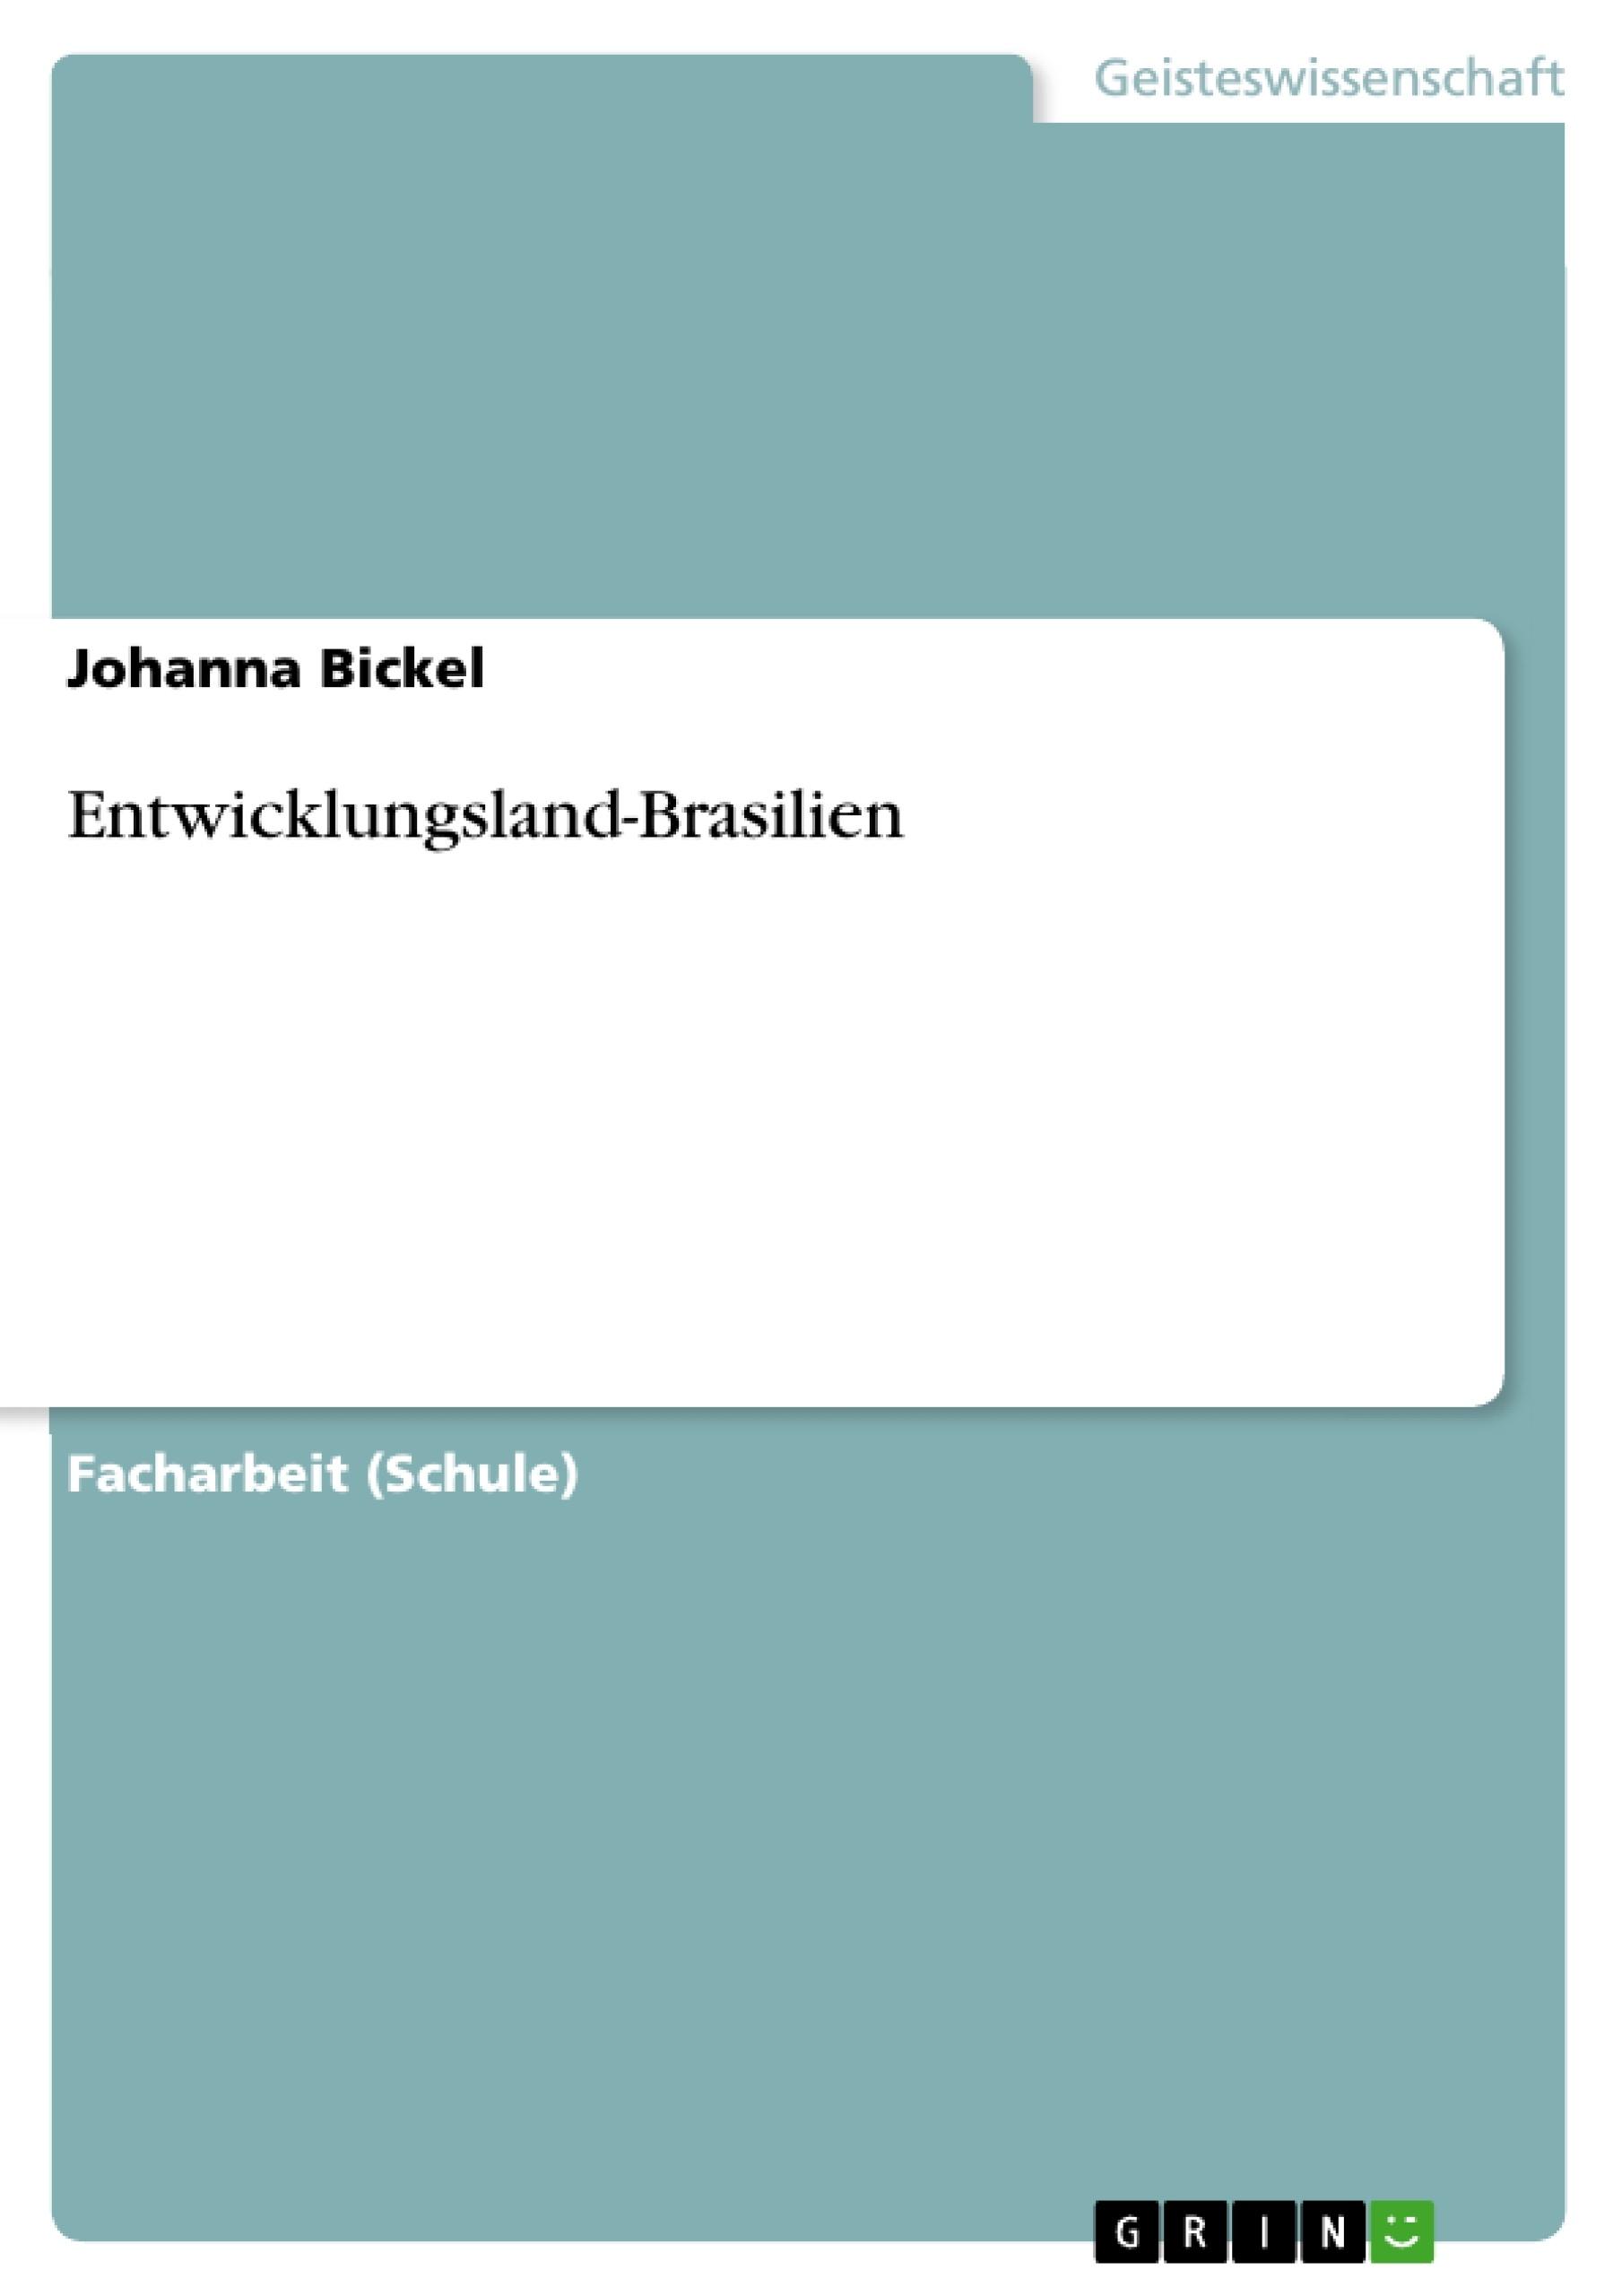 Titel: Entwicklungsland-Brasilien